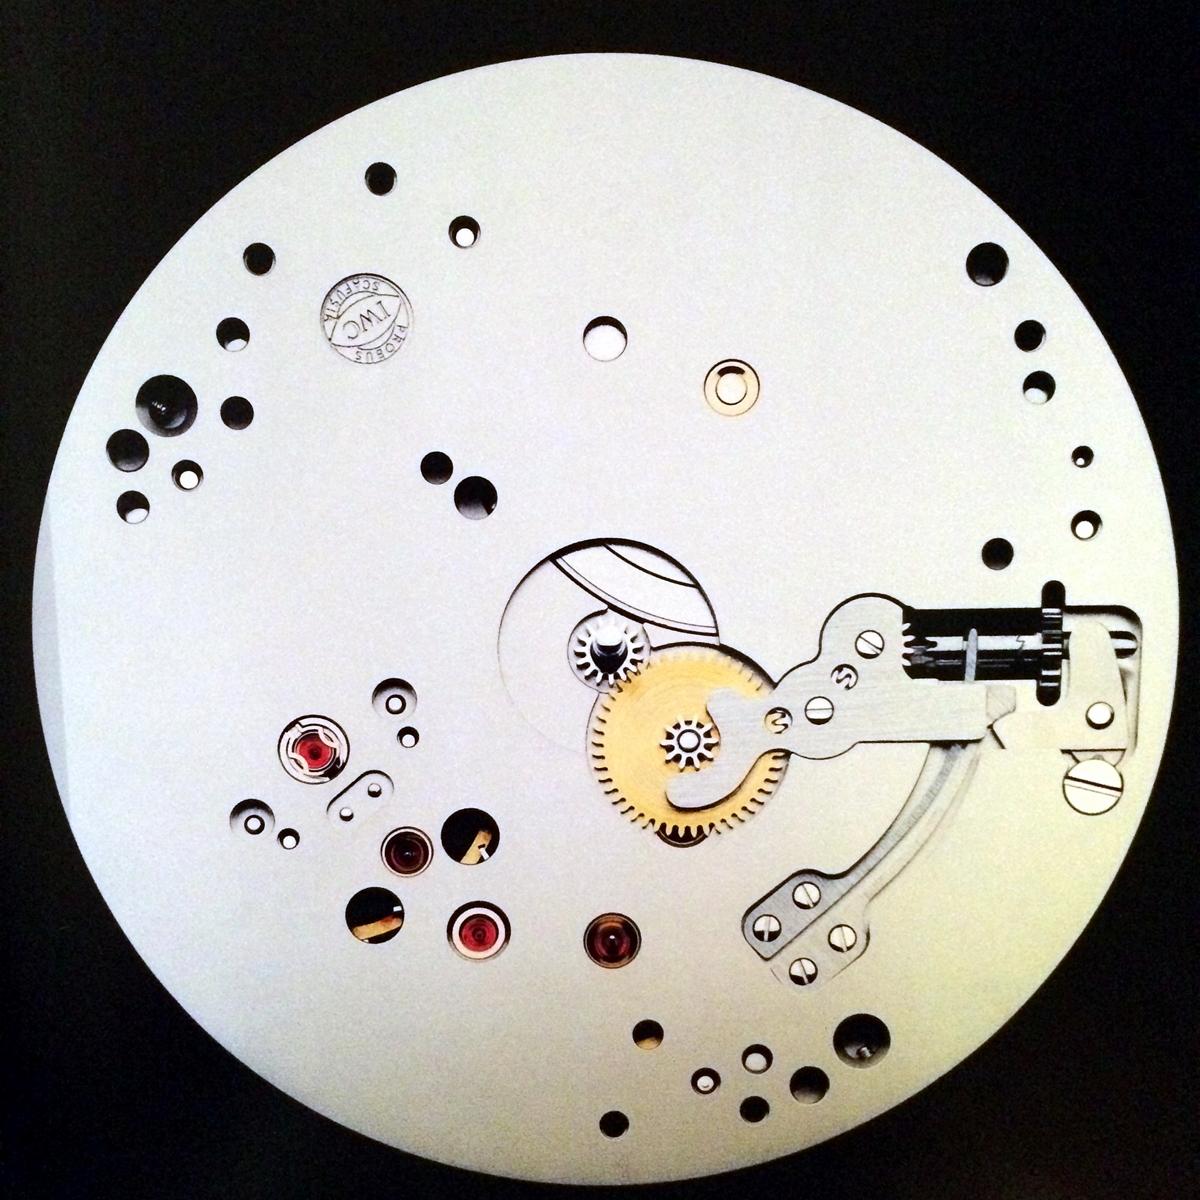 8 design z zegarkiem w ręku luksusowe zegarki SIHH Geneve lifestyle forelements blog